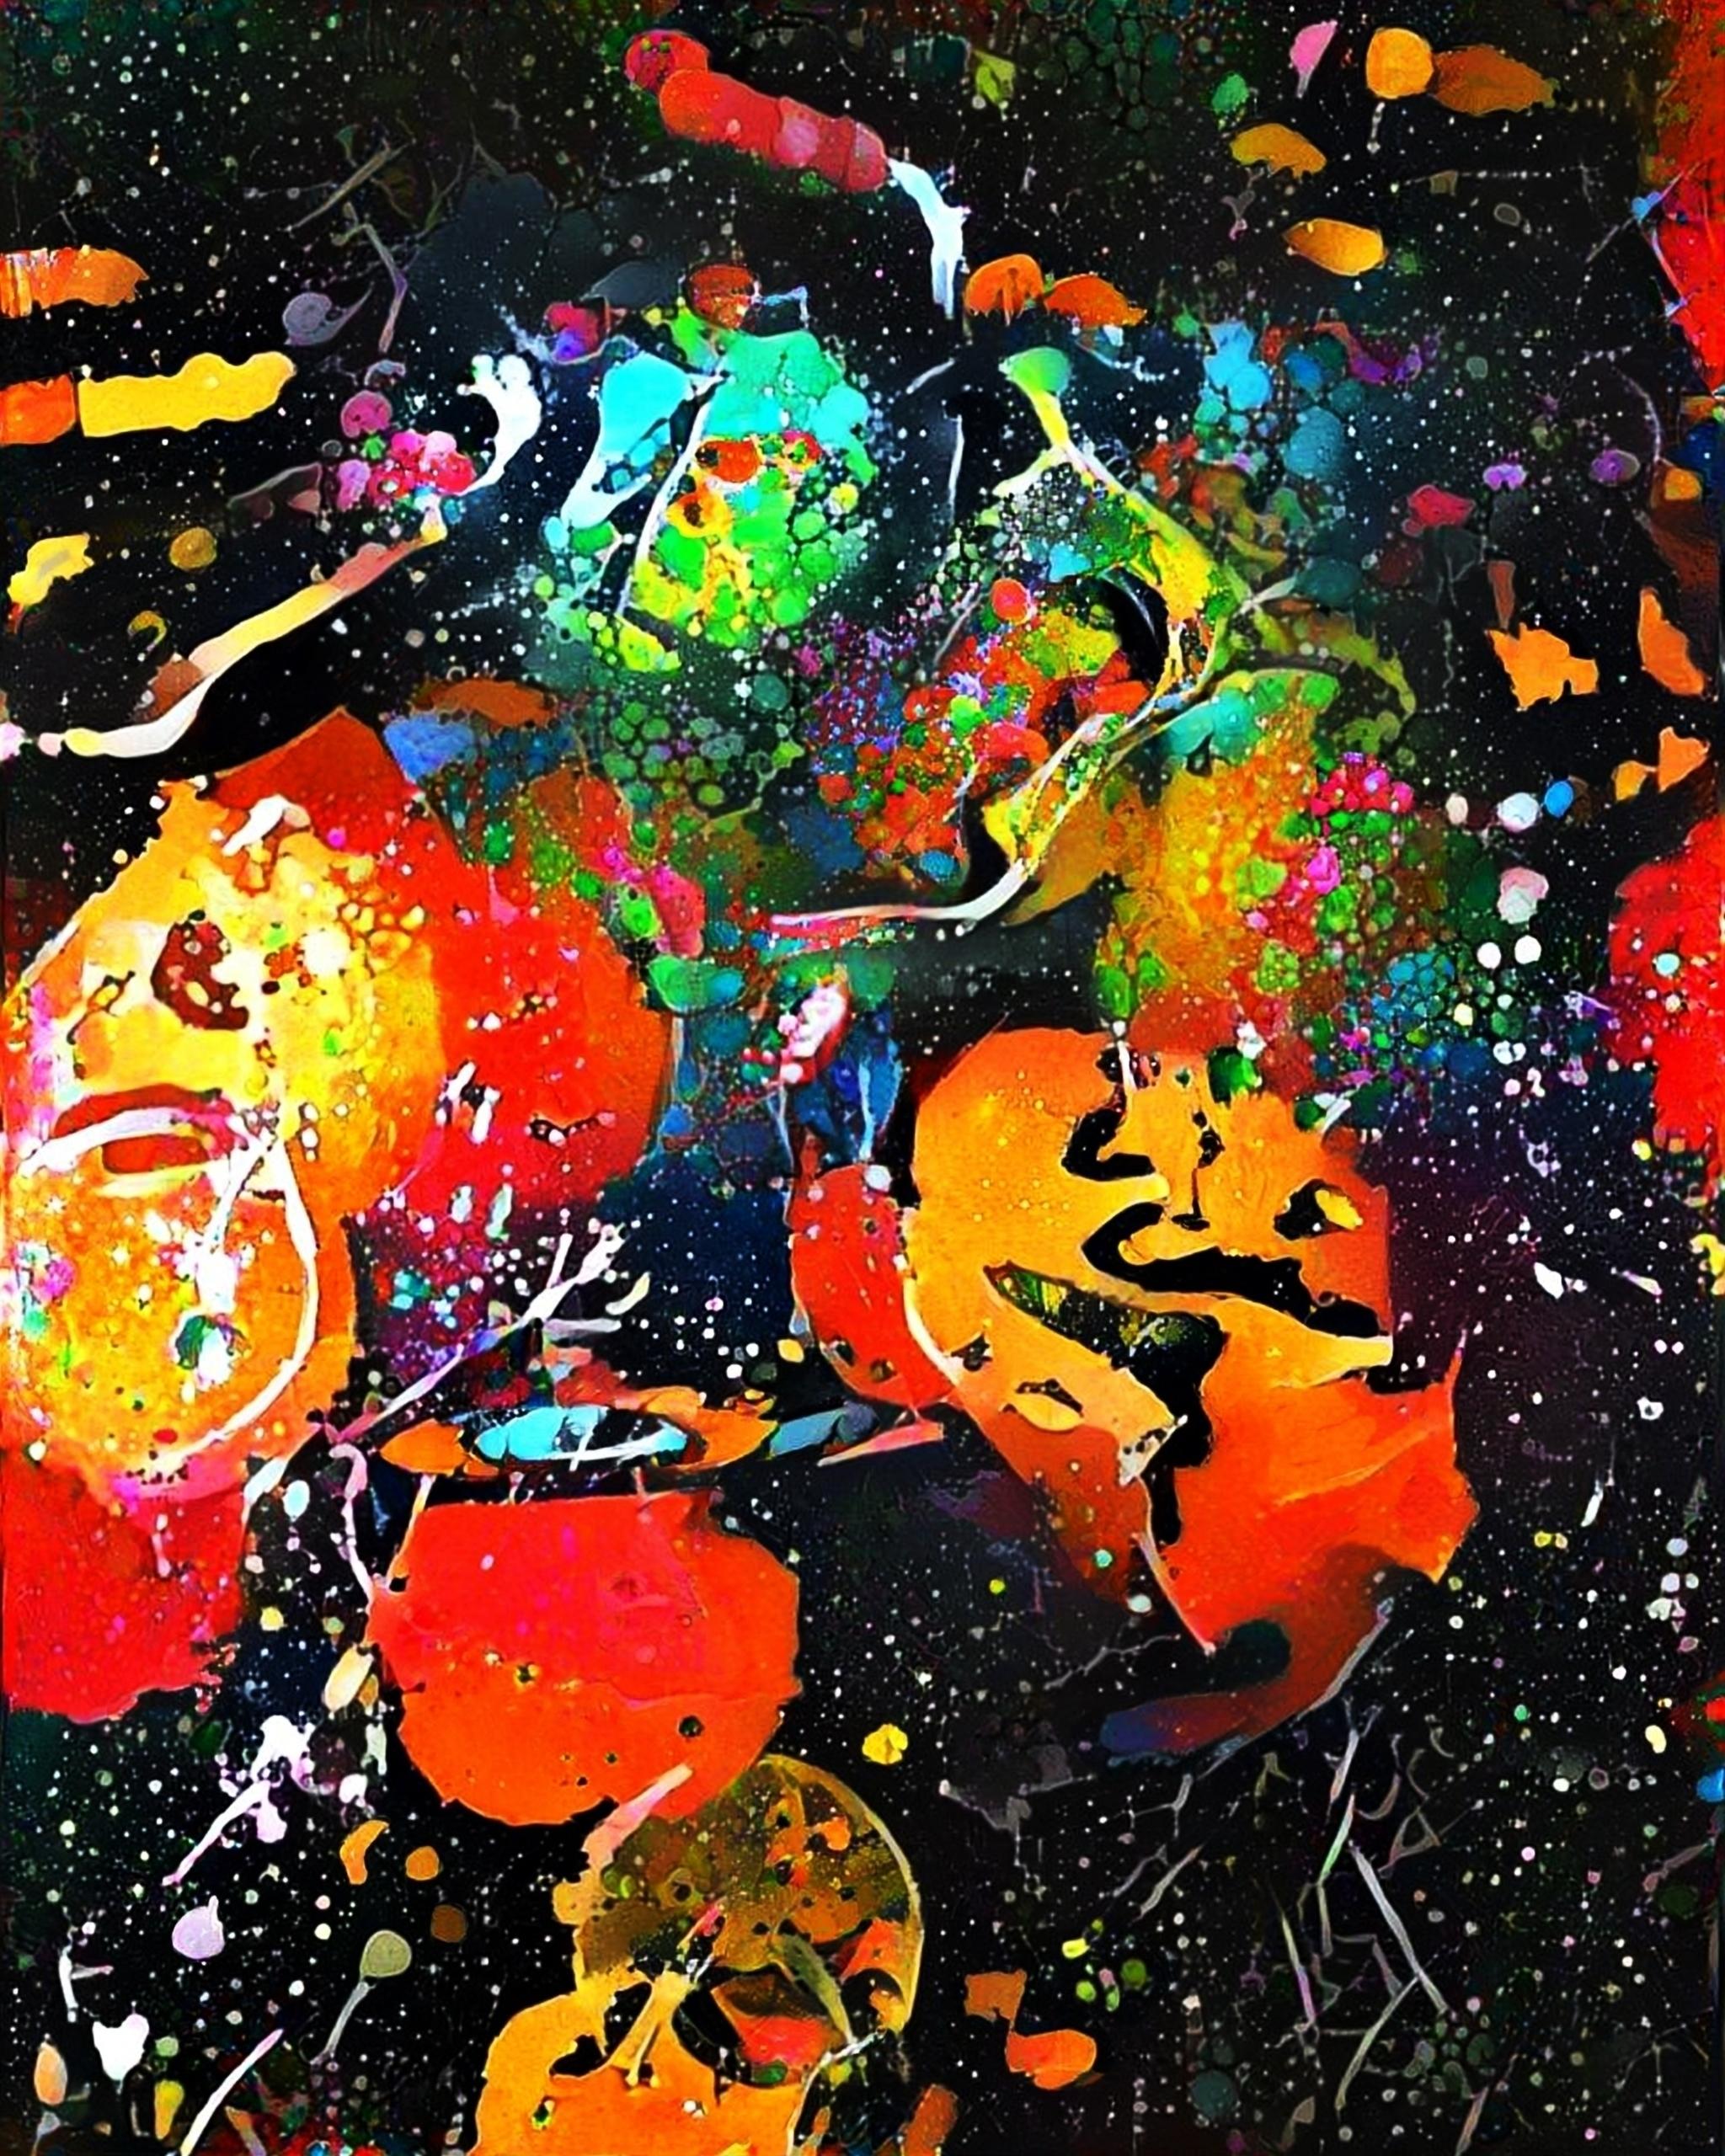 Abstract 3 abstracts - photography - kenlong   ello